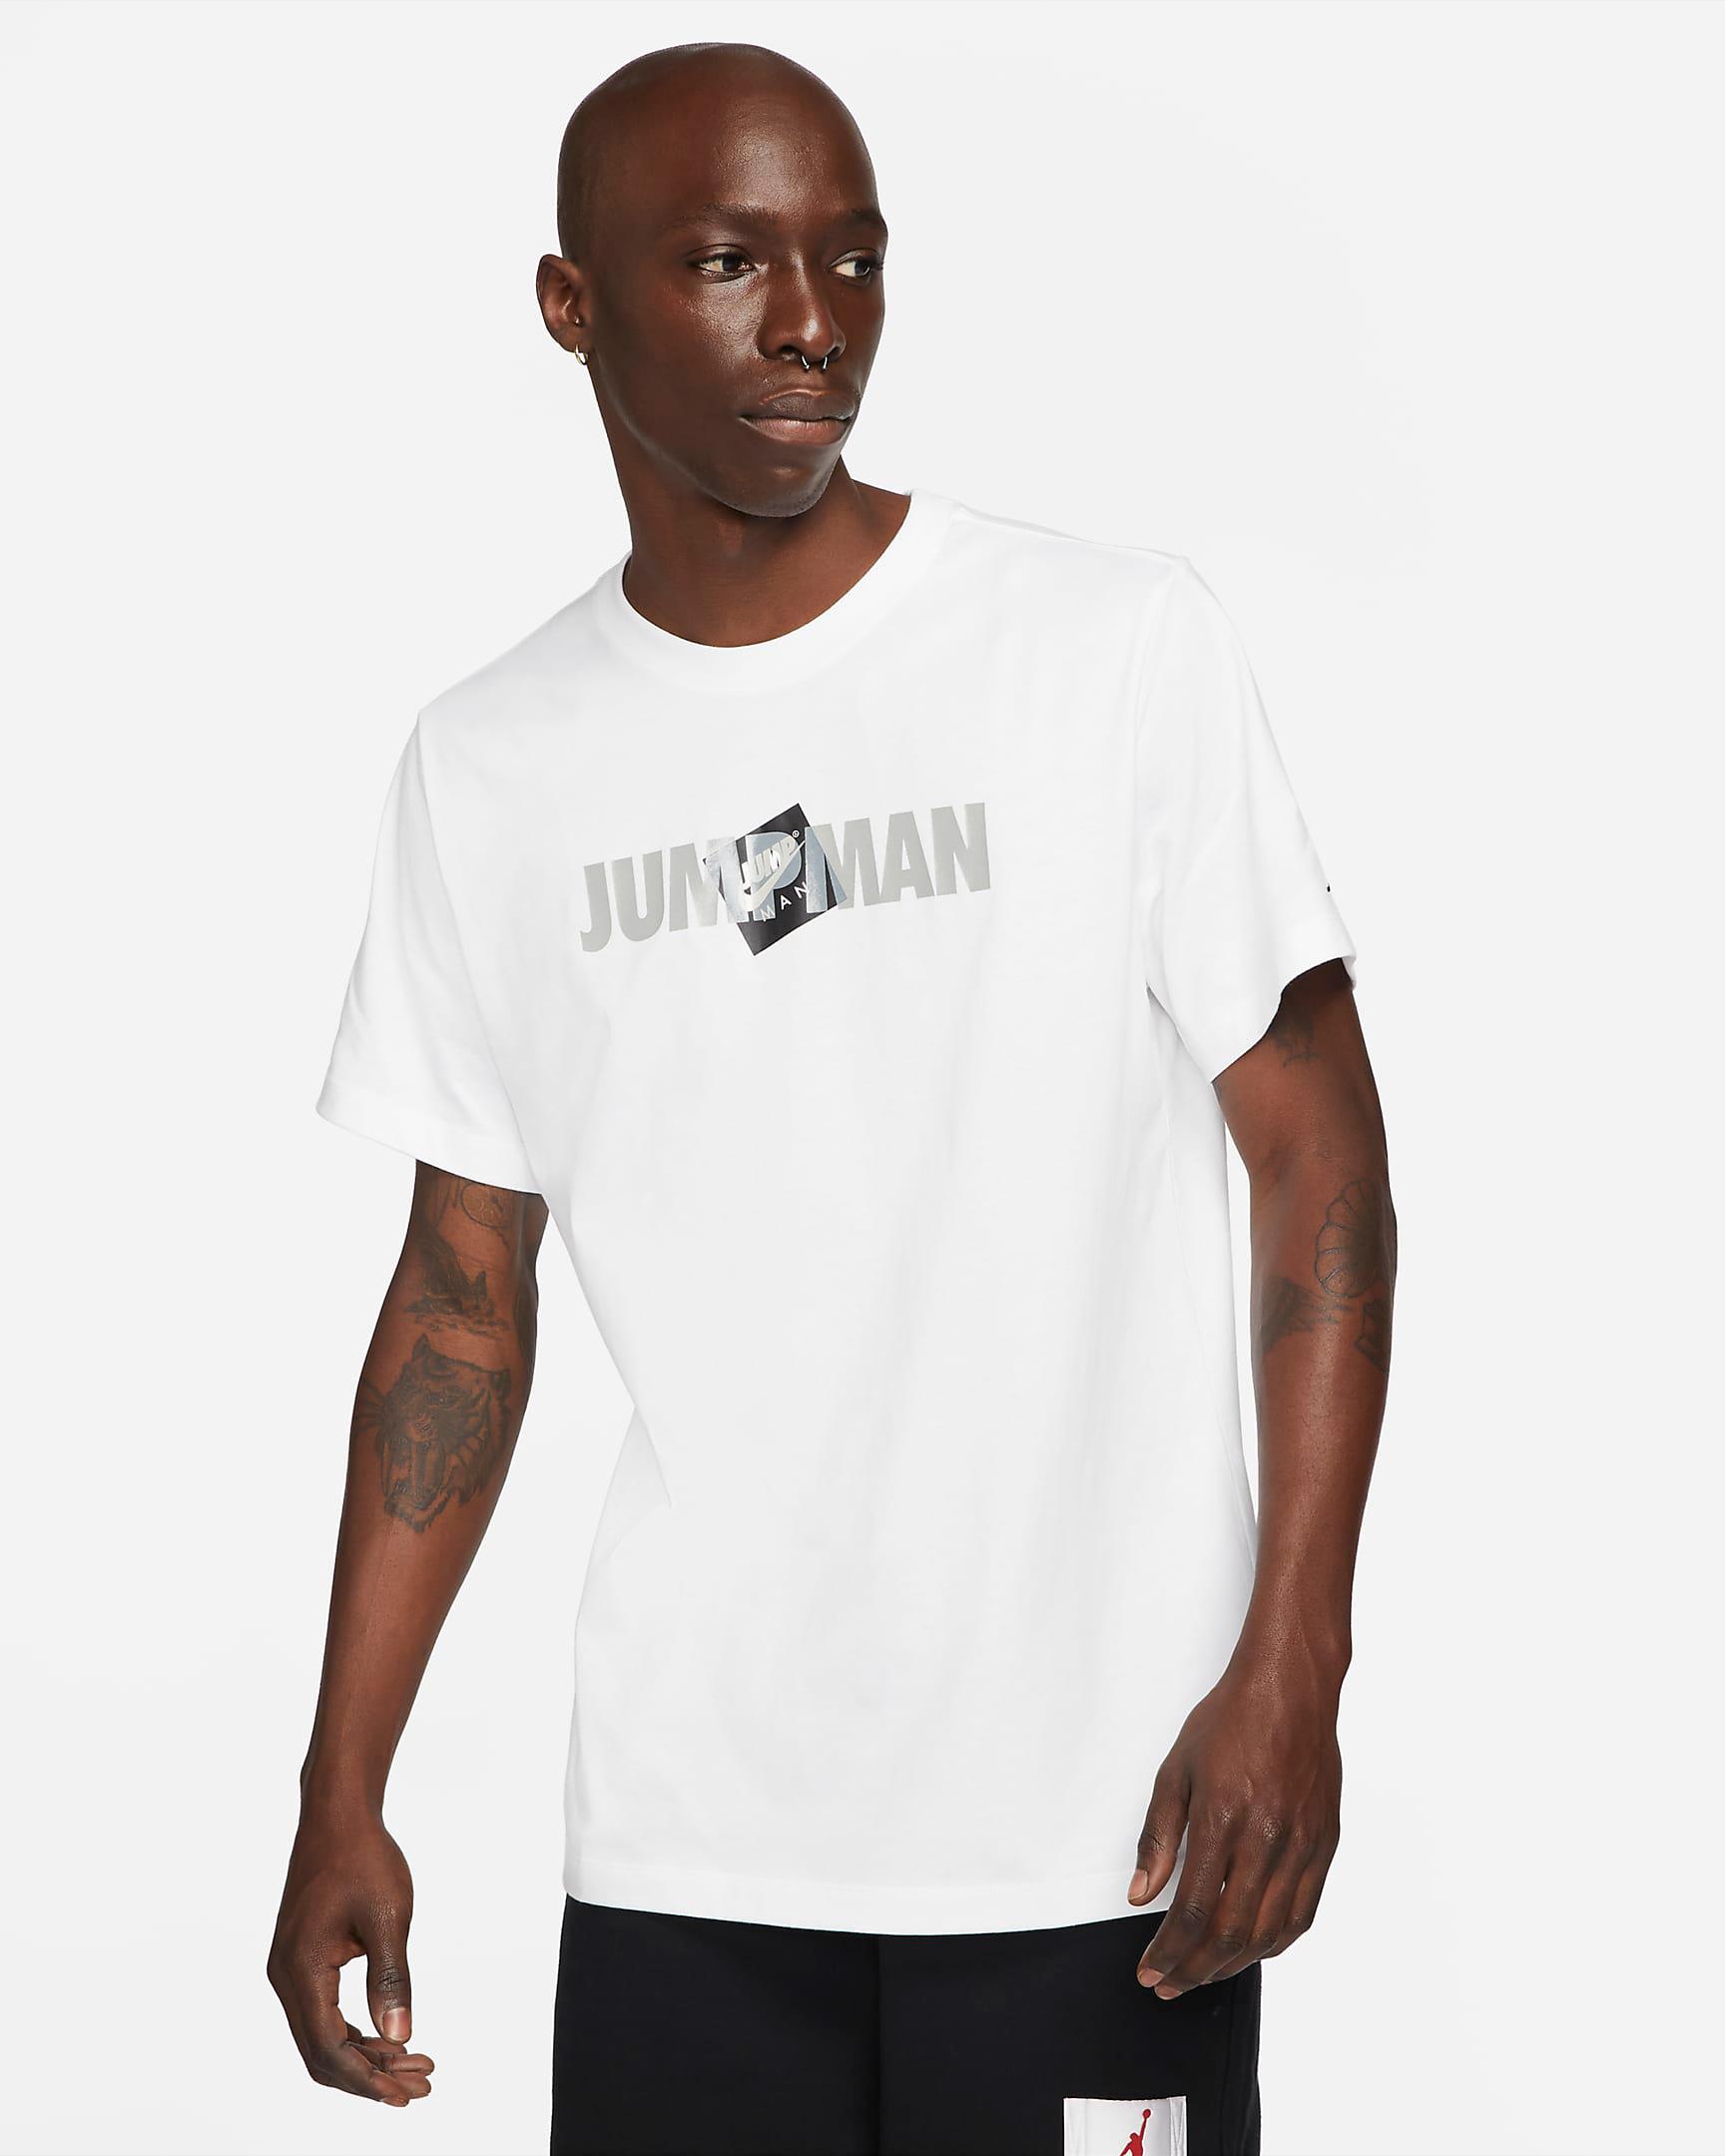 jordan-jumpman-classics-t-shirt-summer-2021-white-black-grey-1